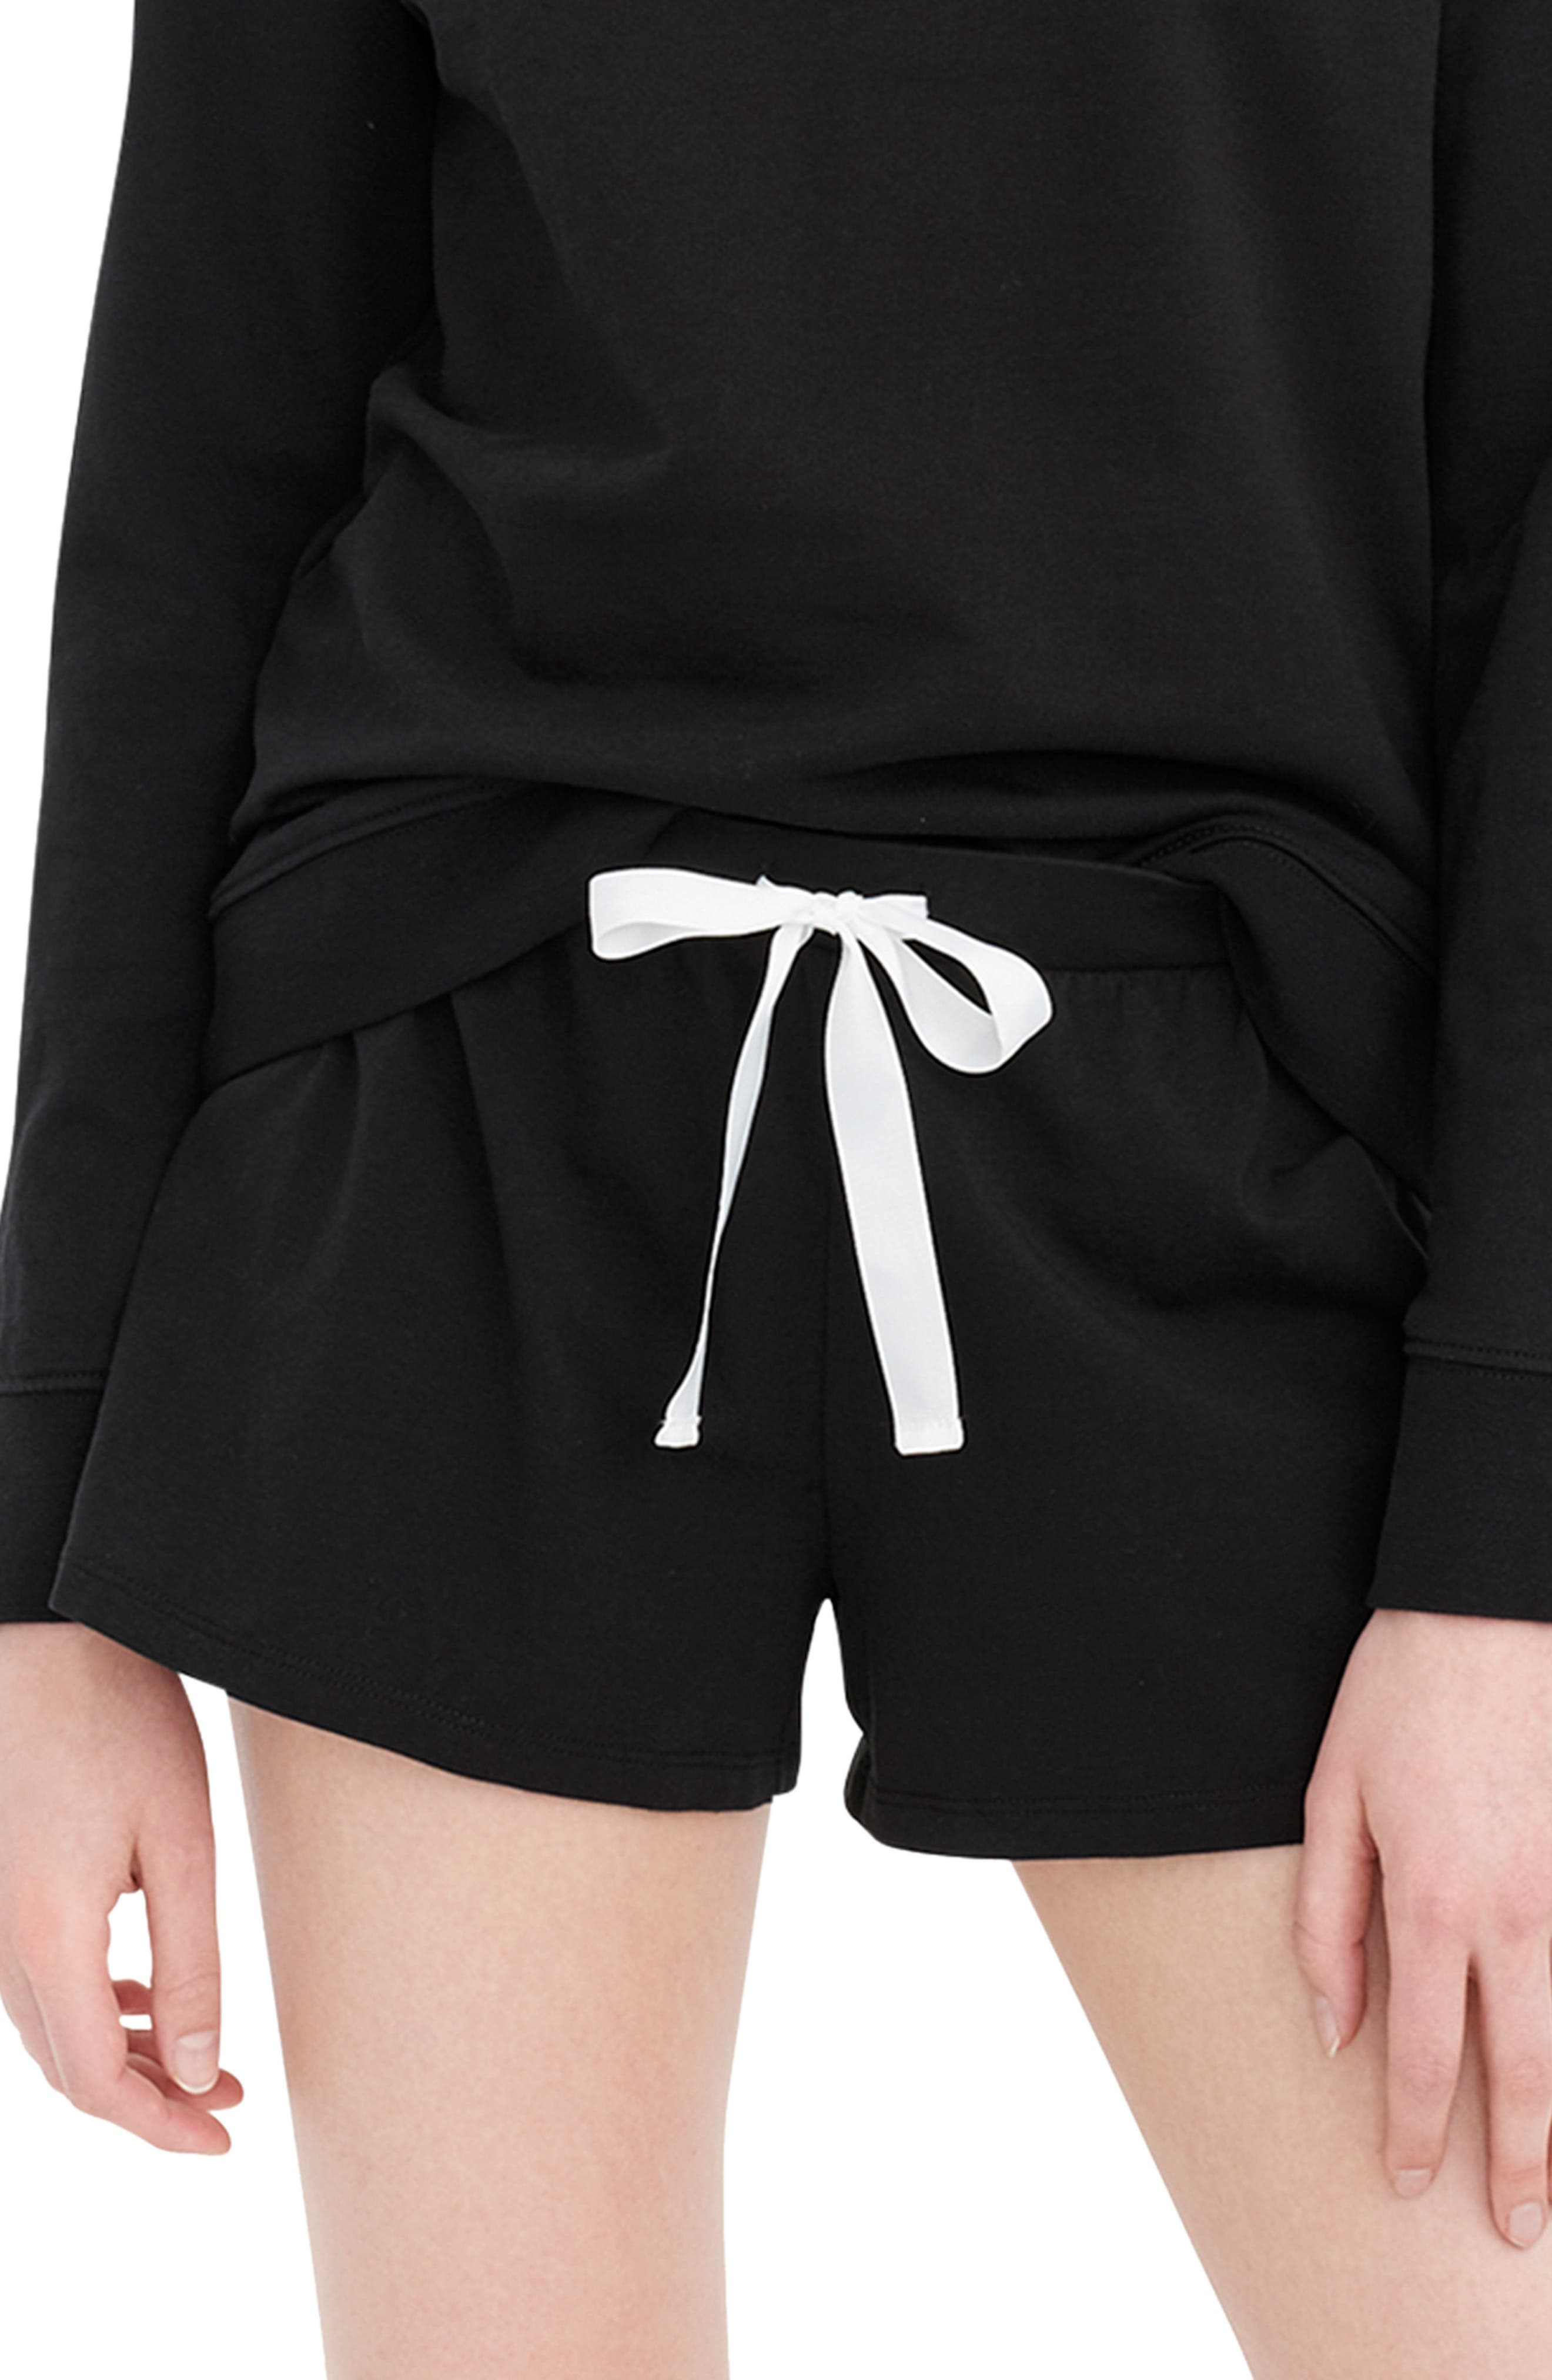 J.crew Dreamy Pajama Shorts, Black